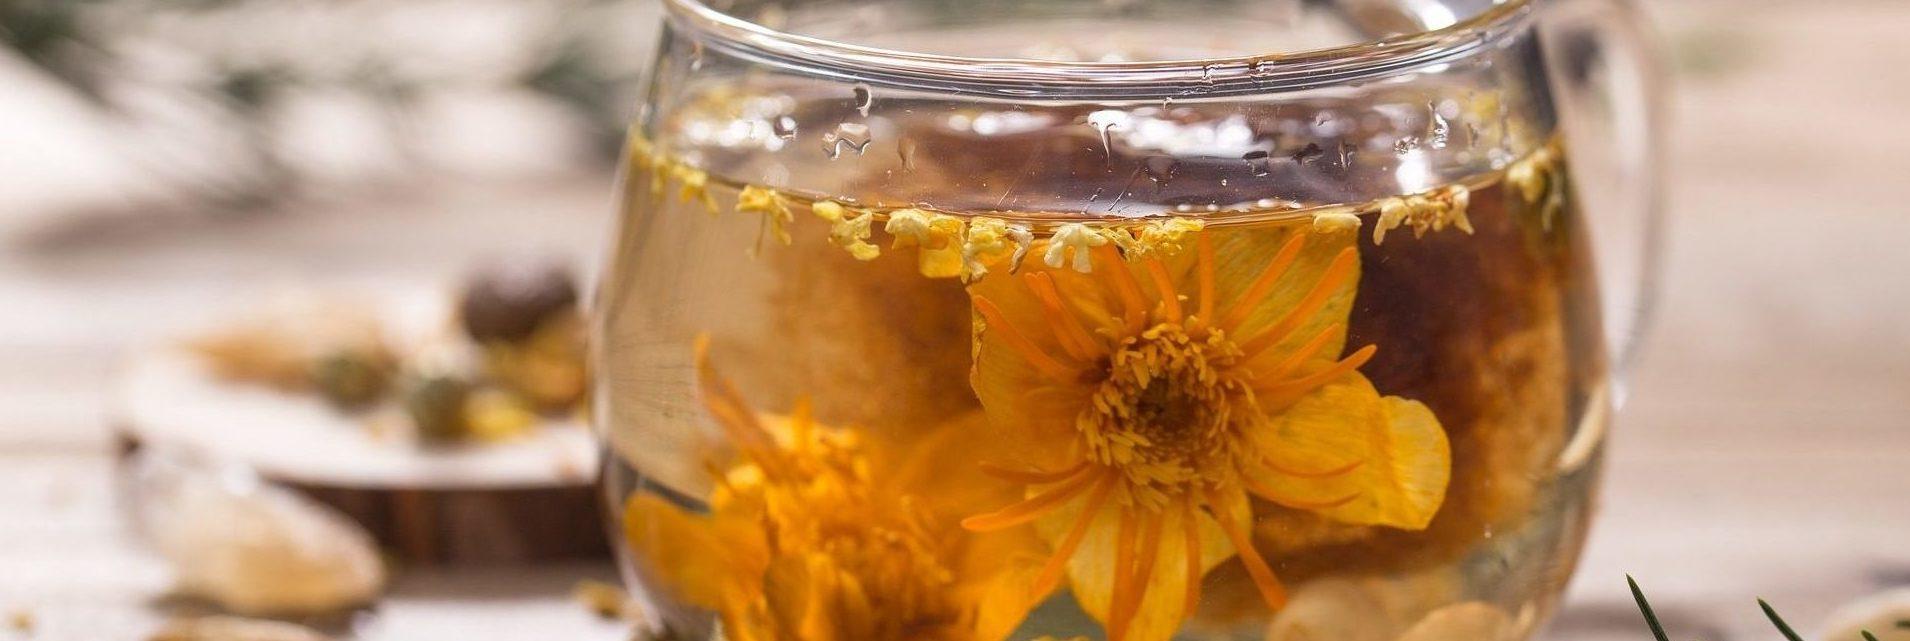 Jasmine A Tea For Love Arogya Holistic Healing